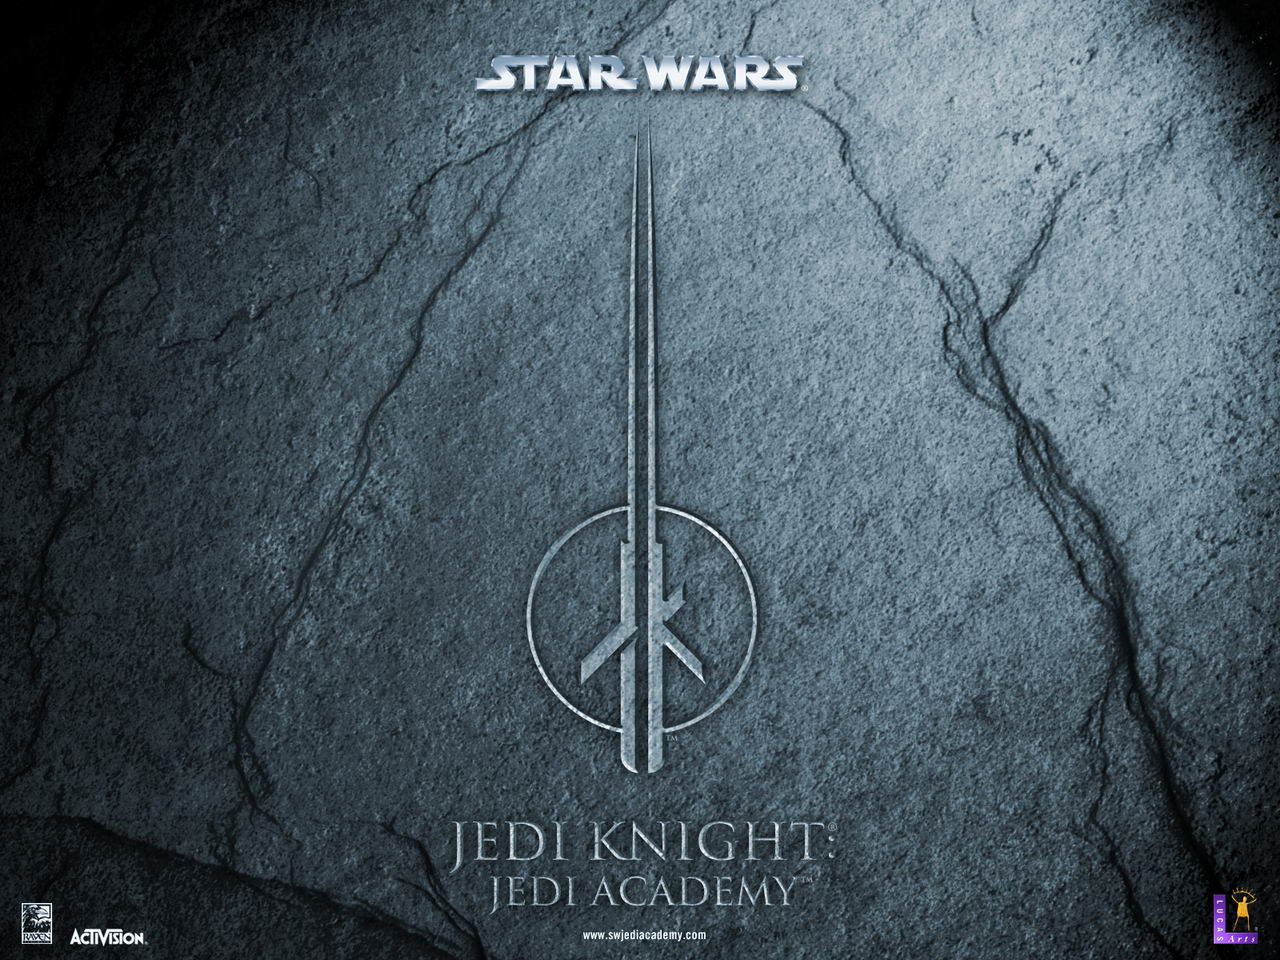 star-wars-jedi-knight-jedi-academy-wallpaper